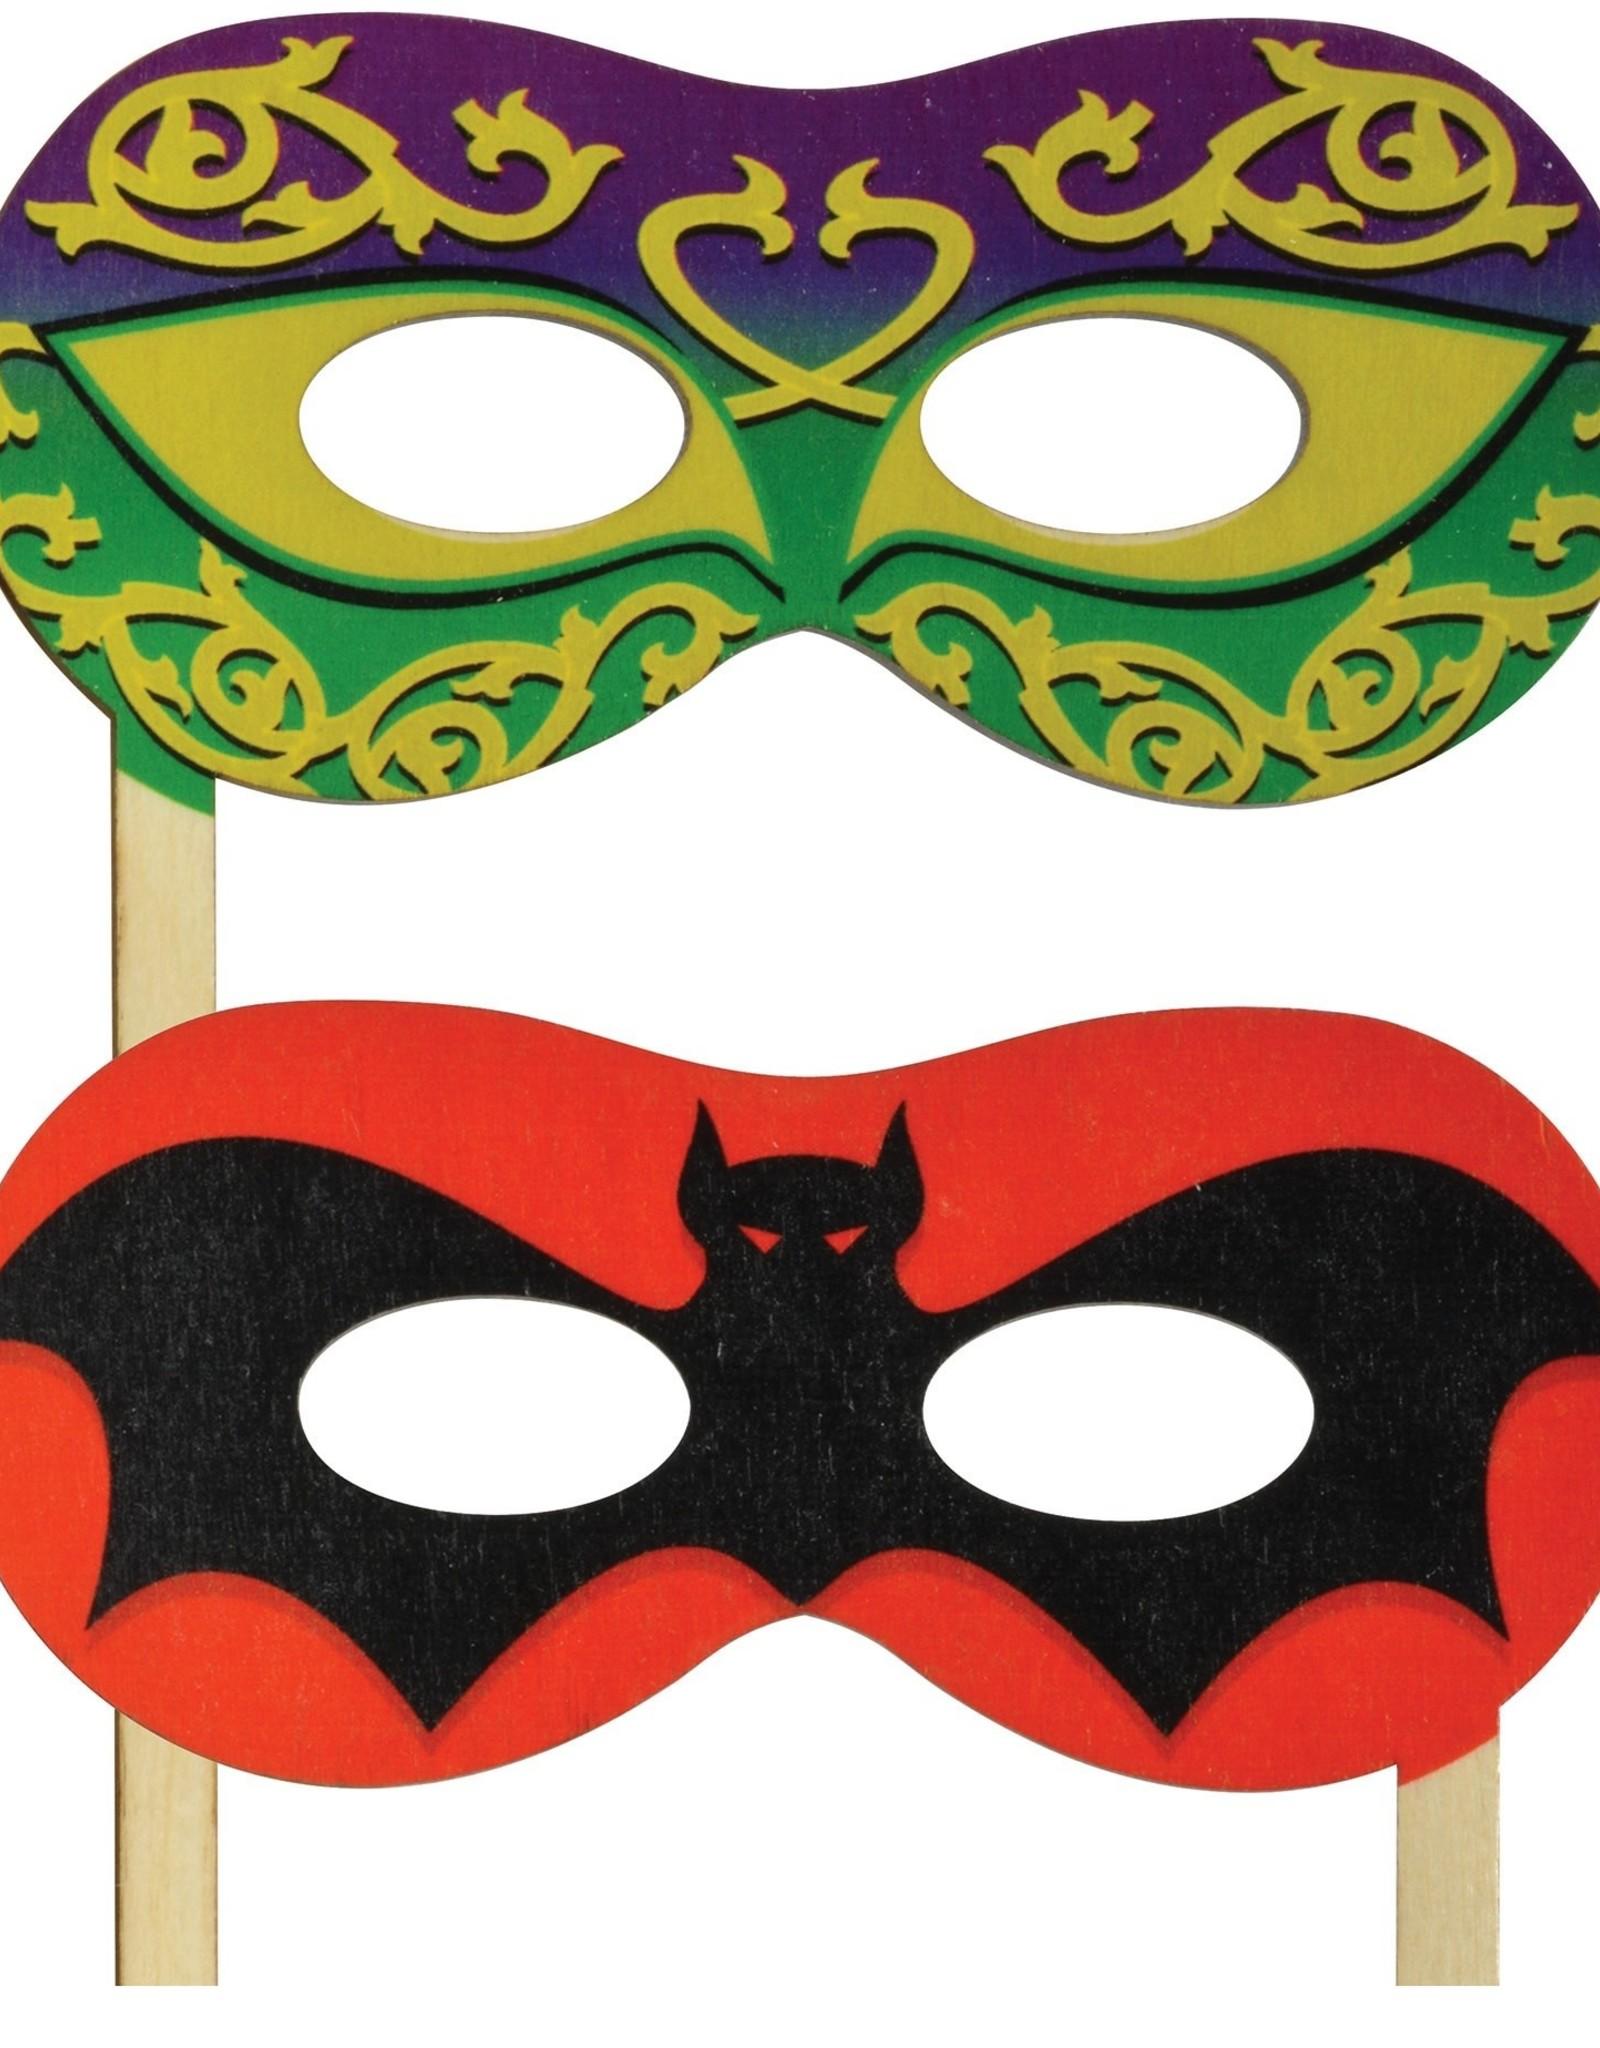 Maple Landmark Silly Sticks Mask